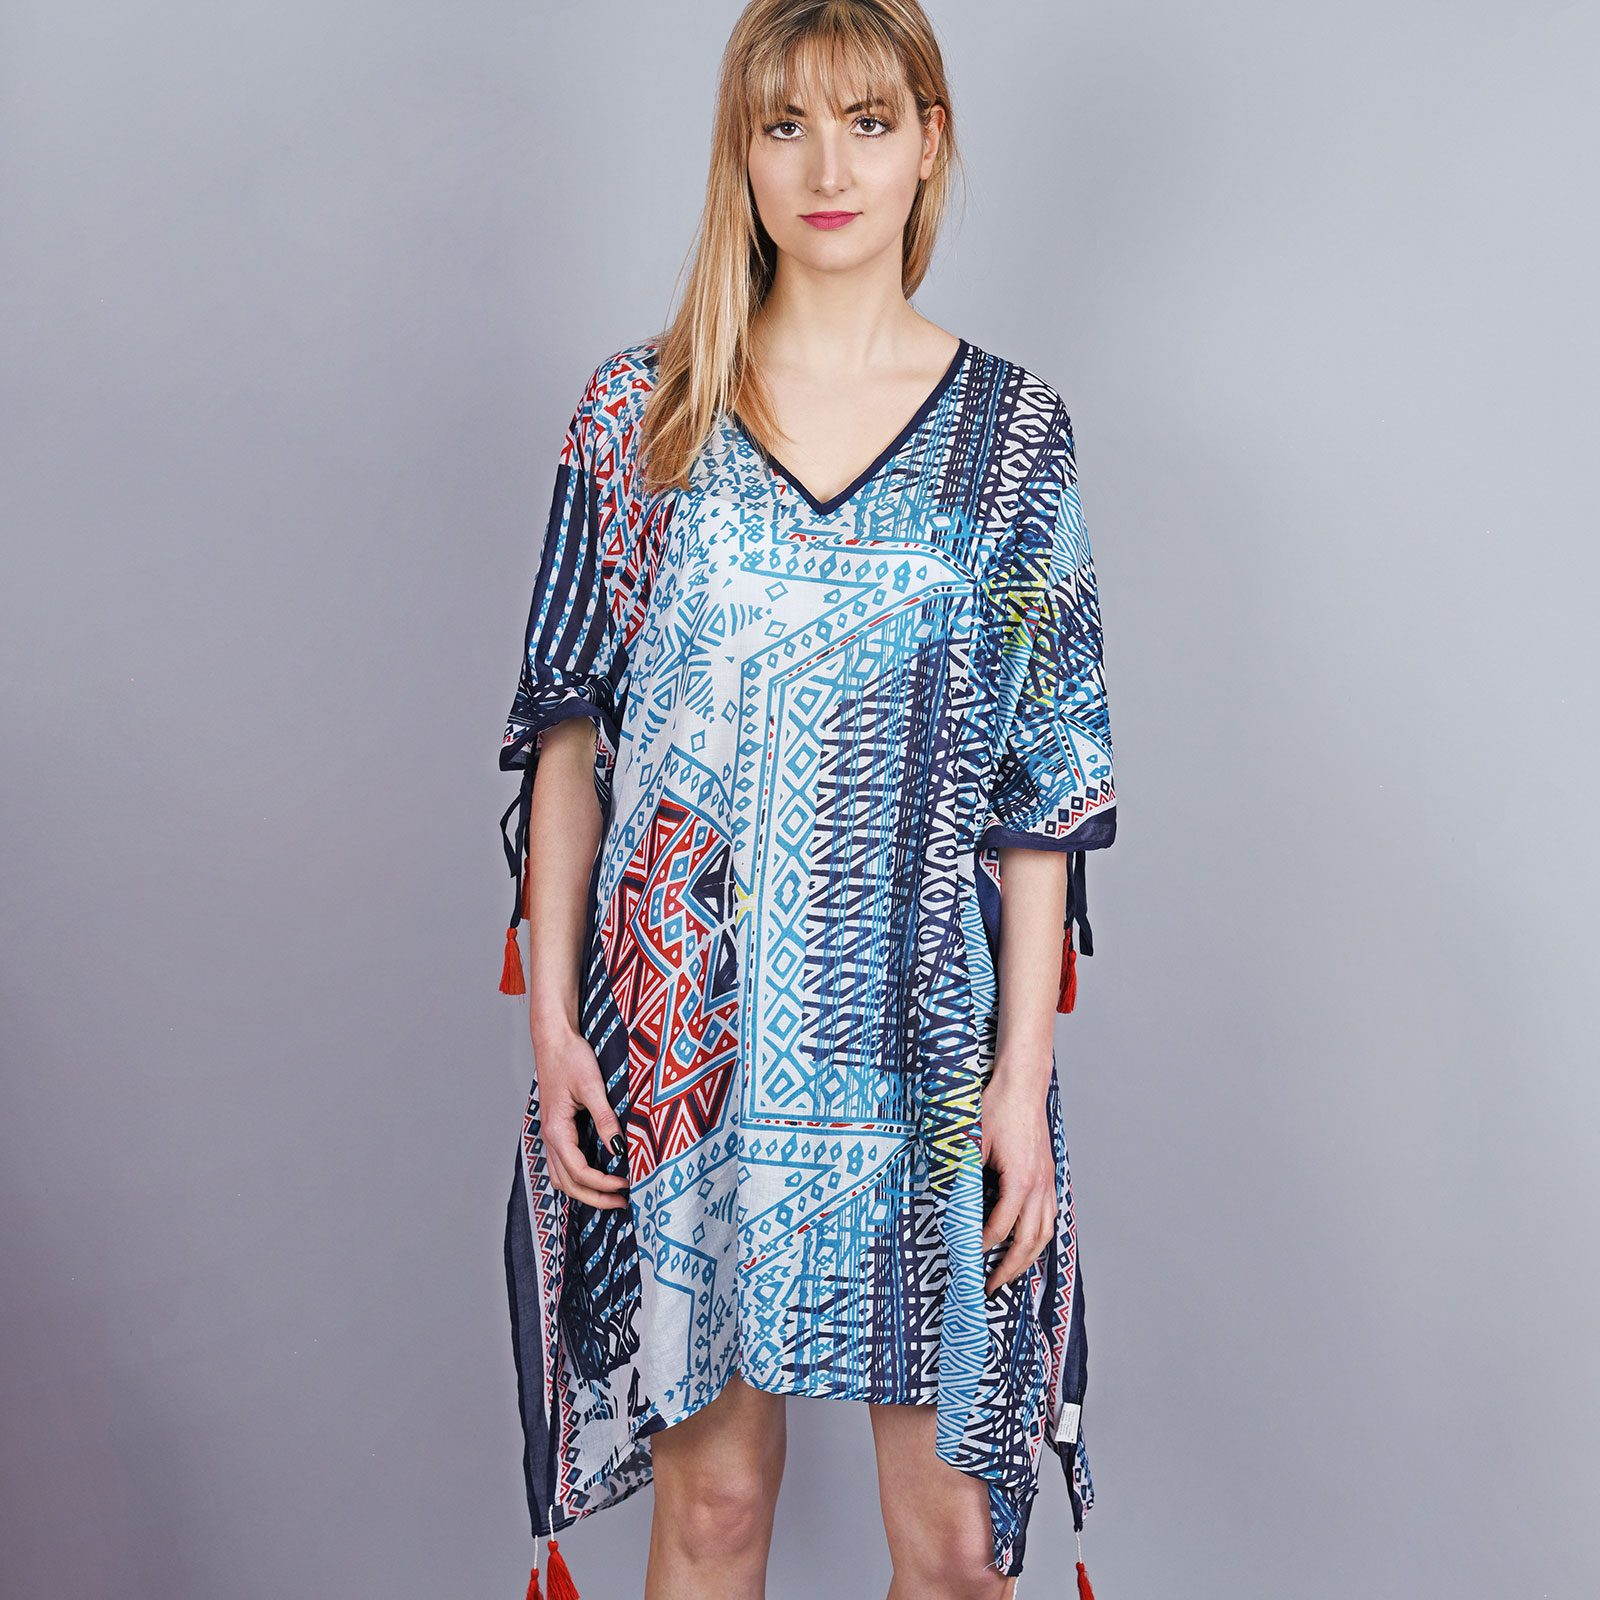 http://lookbook.allee-du-foulard.fr/wp-content/uploads/2018/06/AT-04327-VF16-tunique-coton-geometrique-bleu-1600x1600.jpg